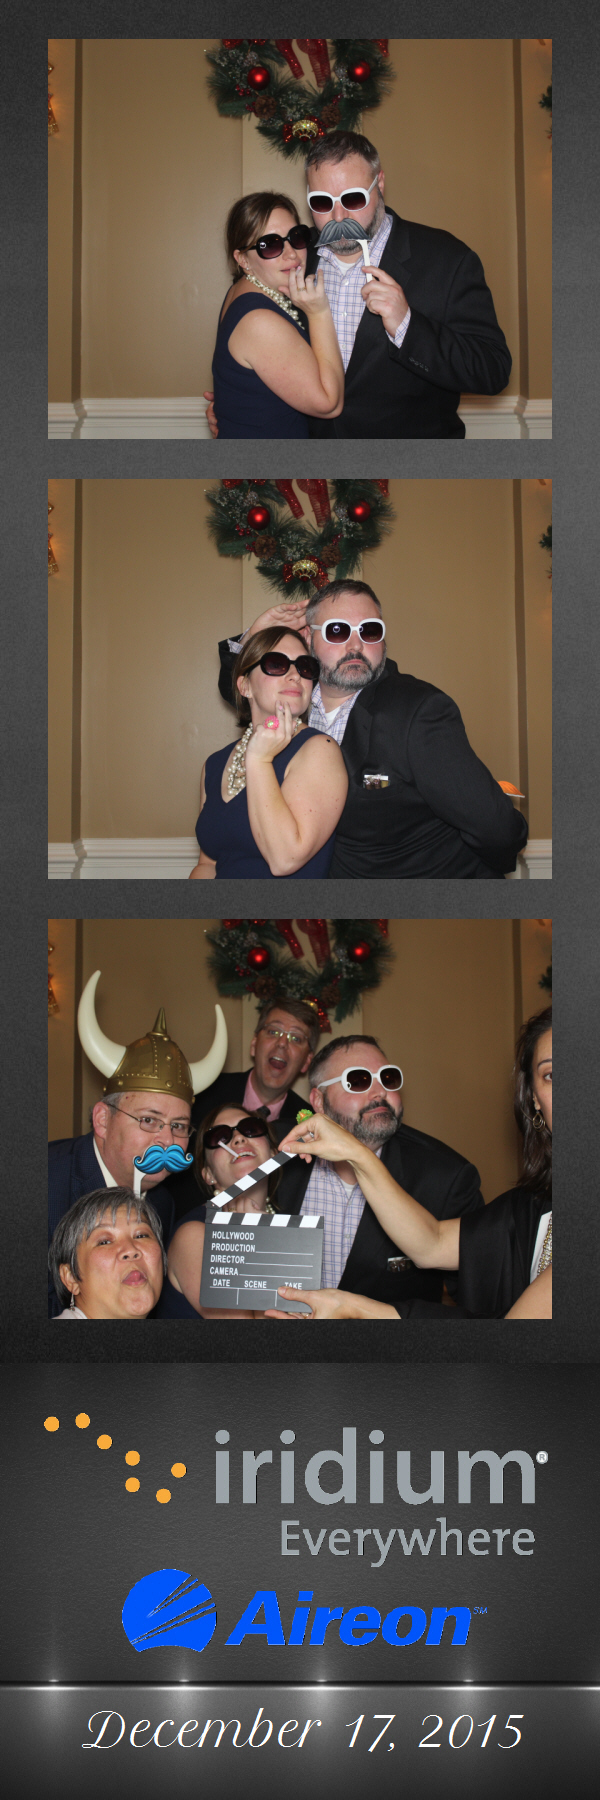 Guest House Events Photo Booth Iridium (43).jpg